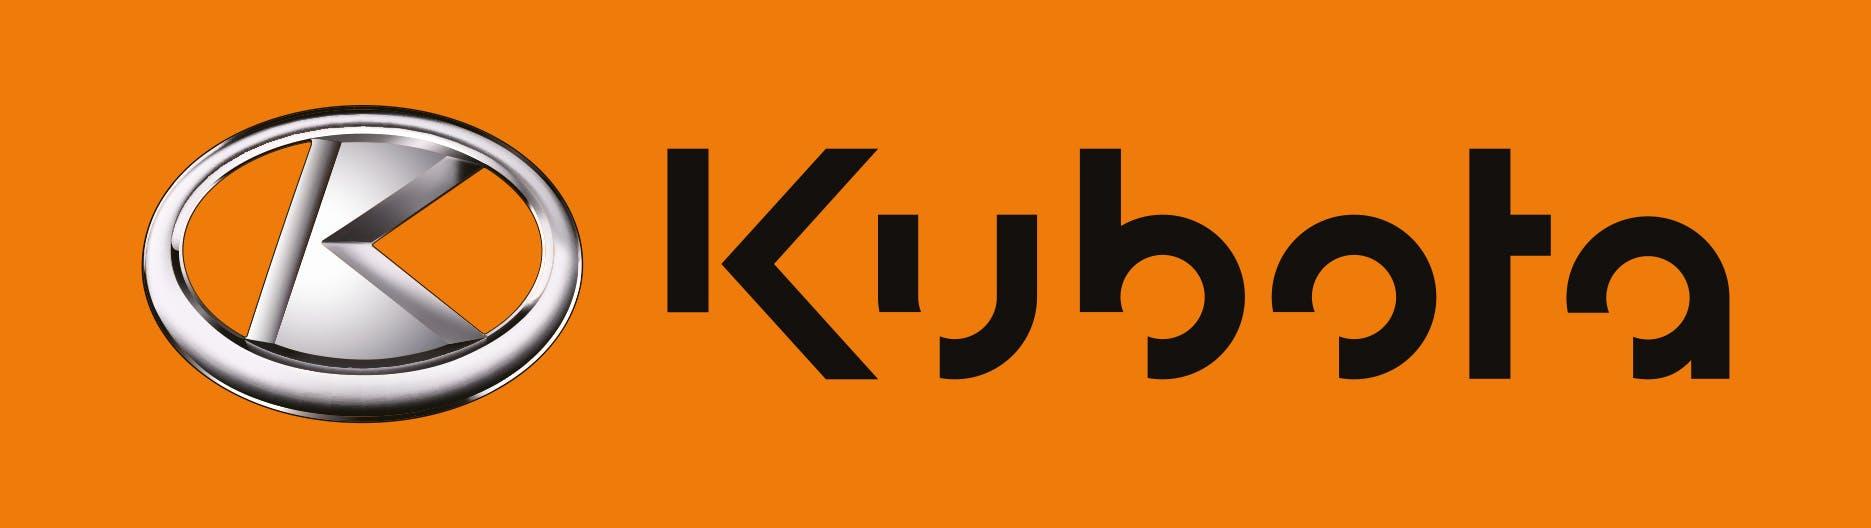 Company logo for 'Kubota Tractor Corporation'.